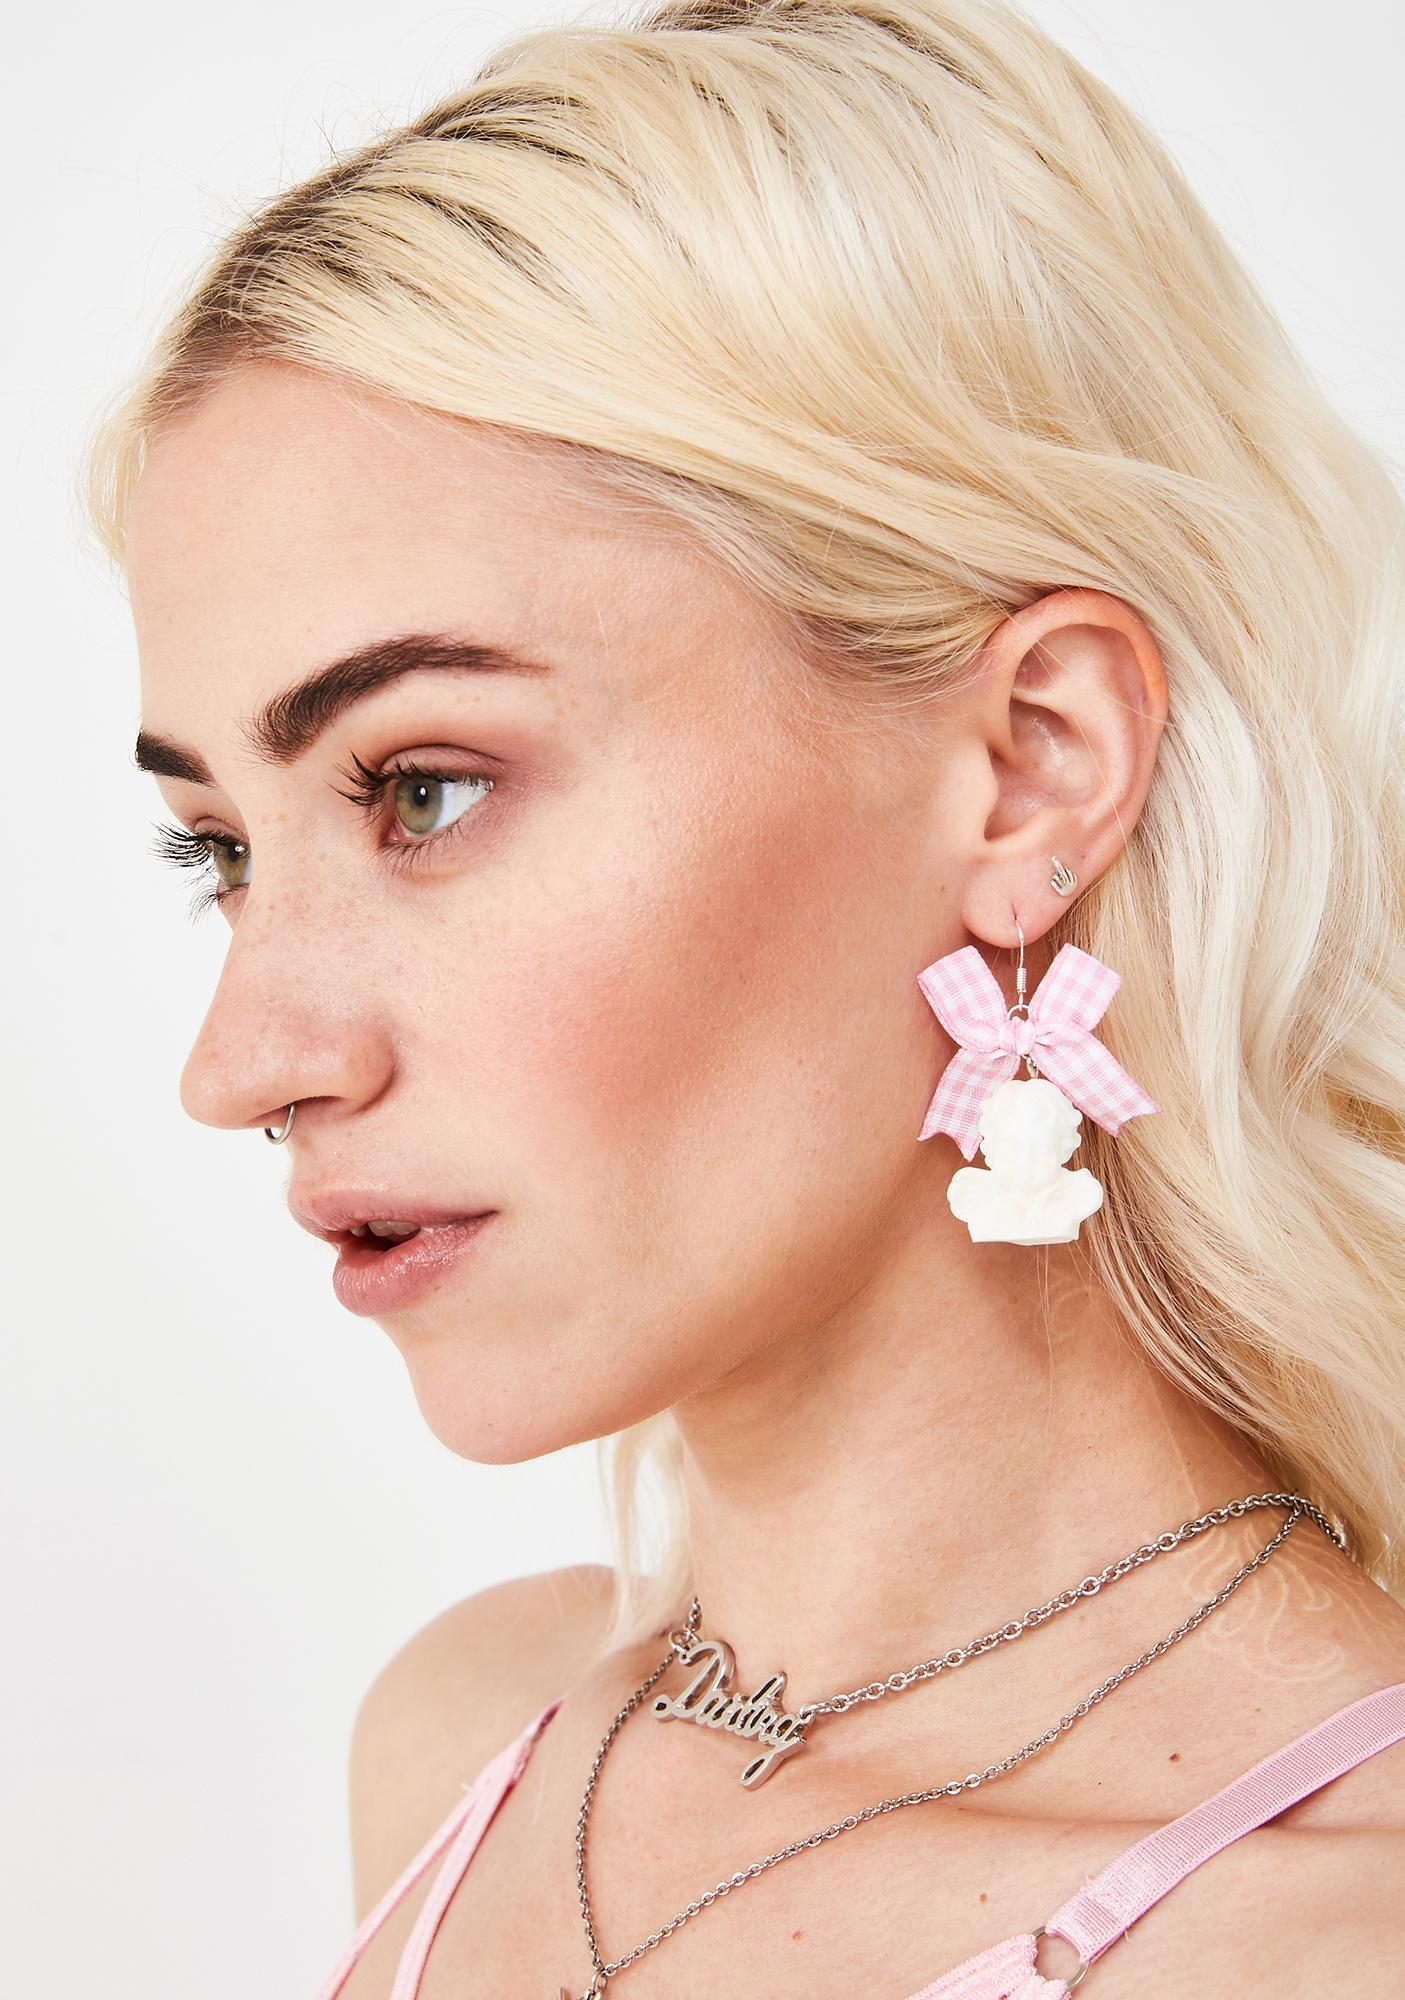 Cheer Up Cherub Earrings